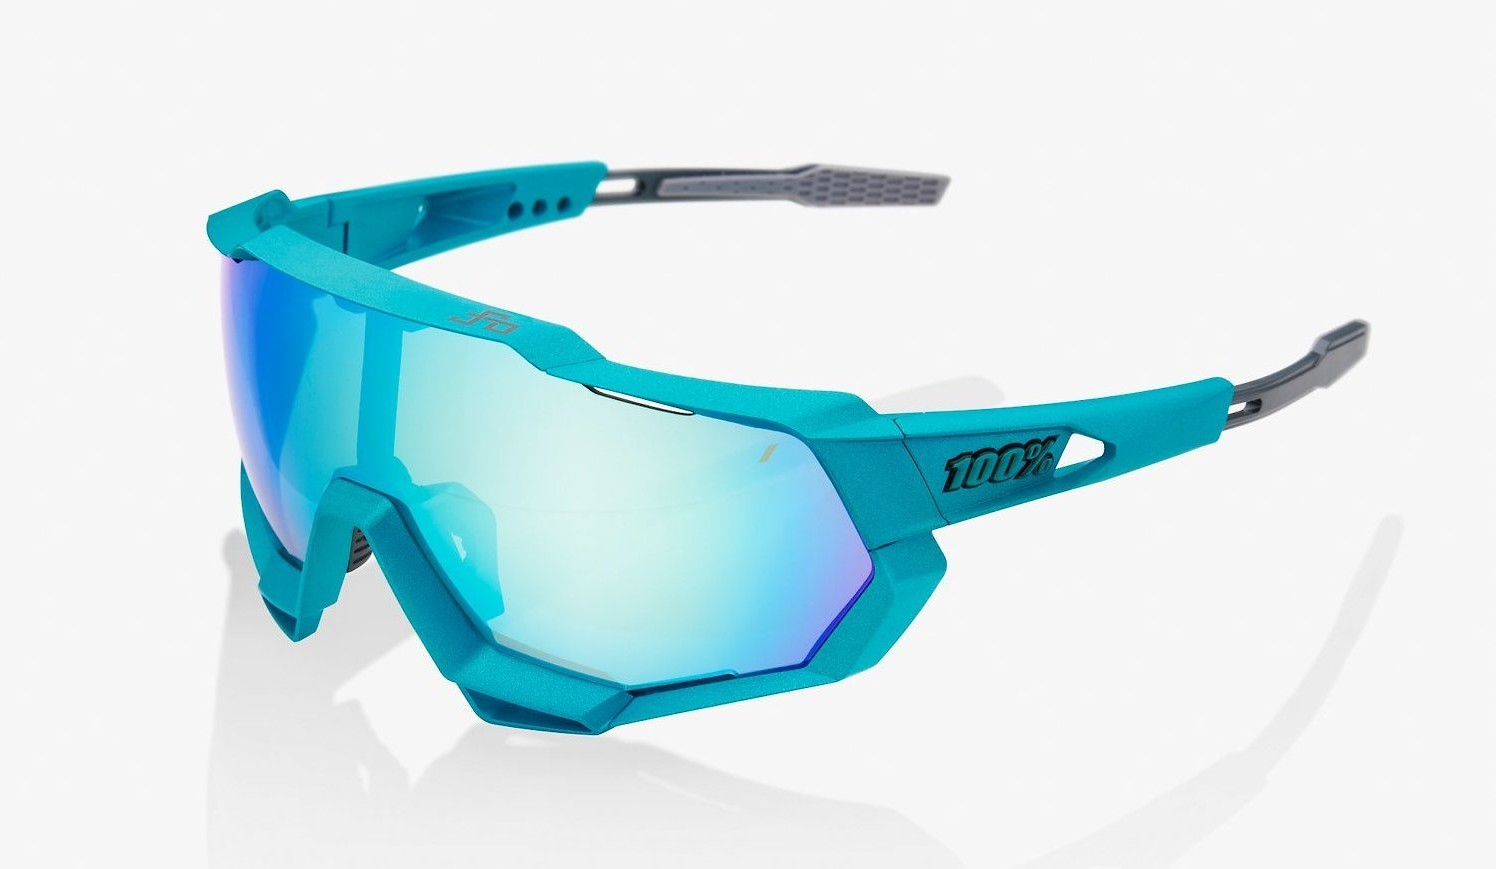 100% Speedtrap - Peter Sagan LE, Blue Topaz Multilayer Mirror Lens